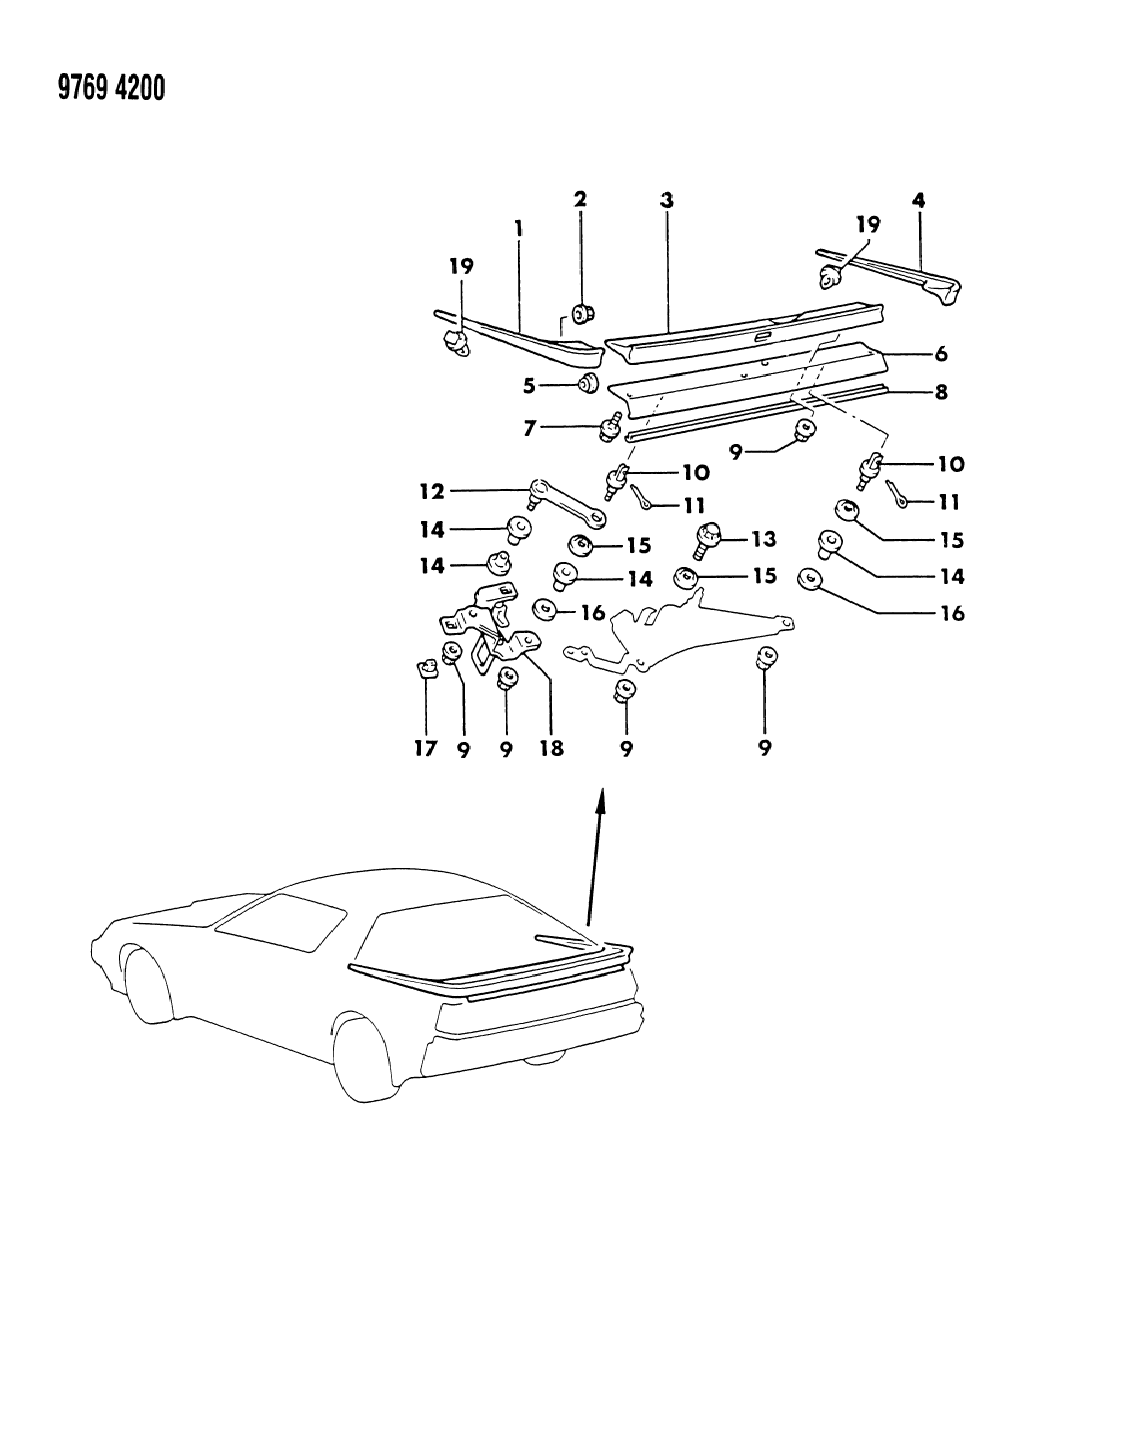 Chrysler Conquest Wiring Diagram - Wiring Diagram